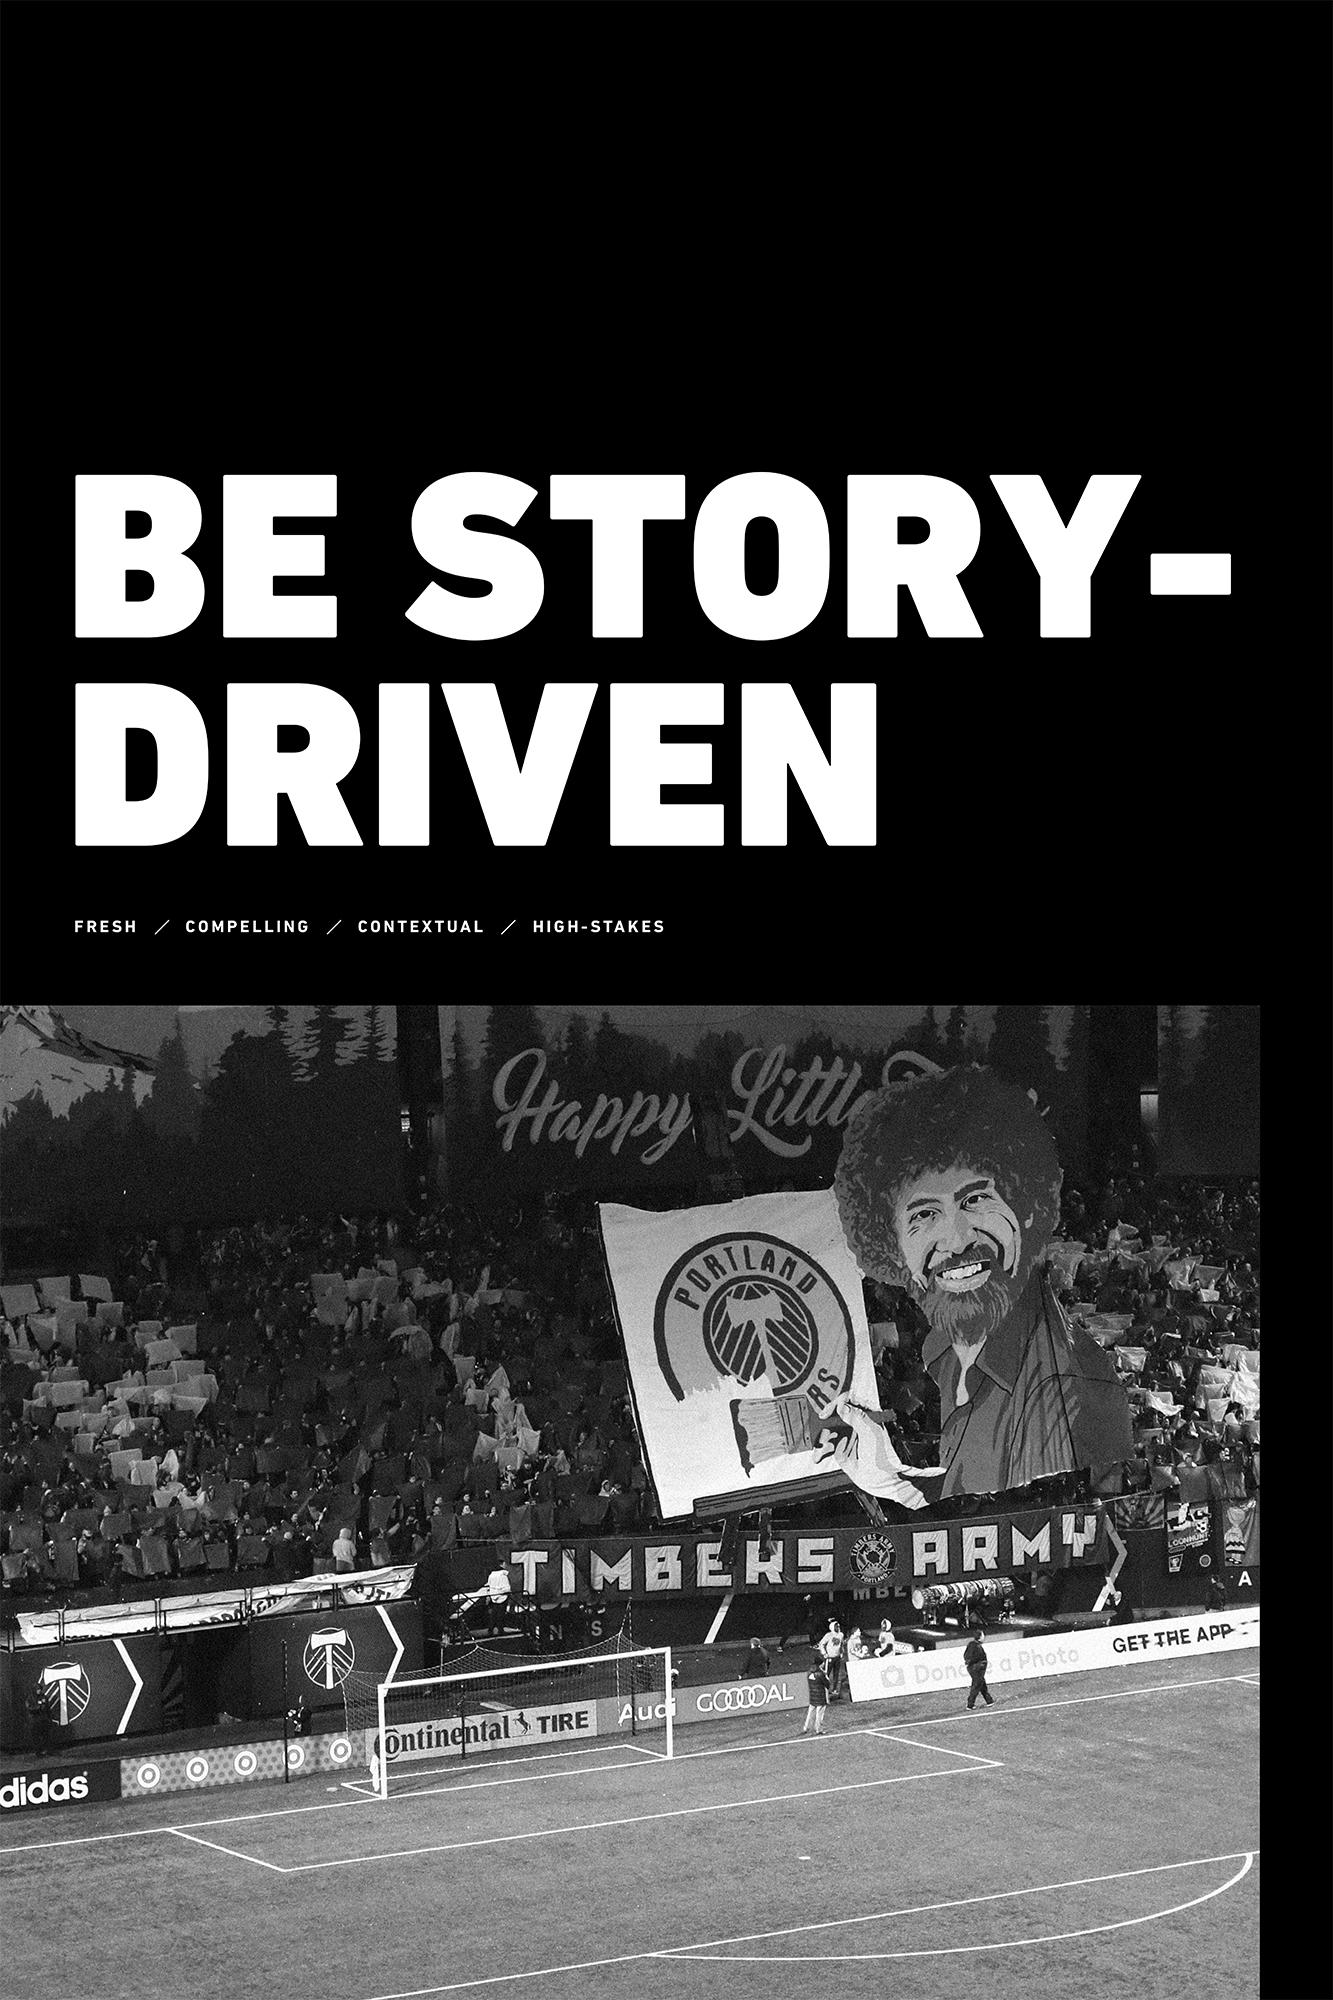 Principles-STORY-DRIVEN.jpg